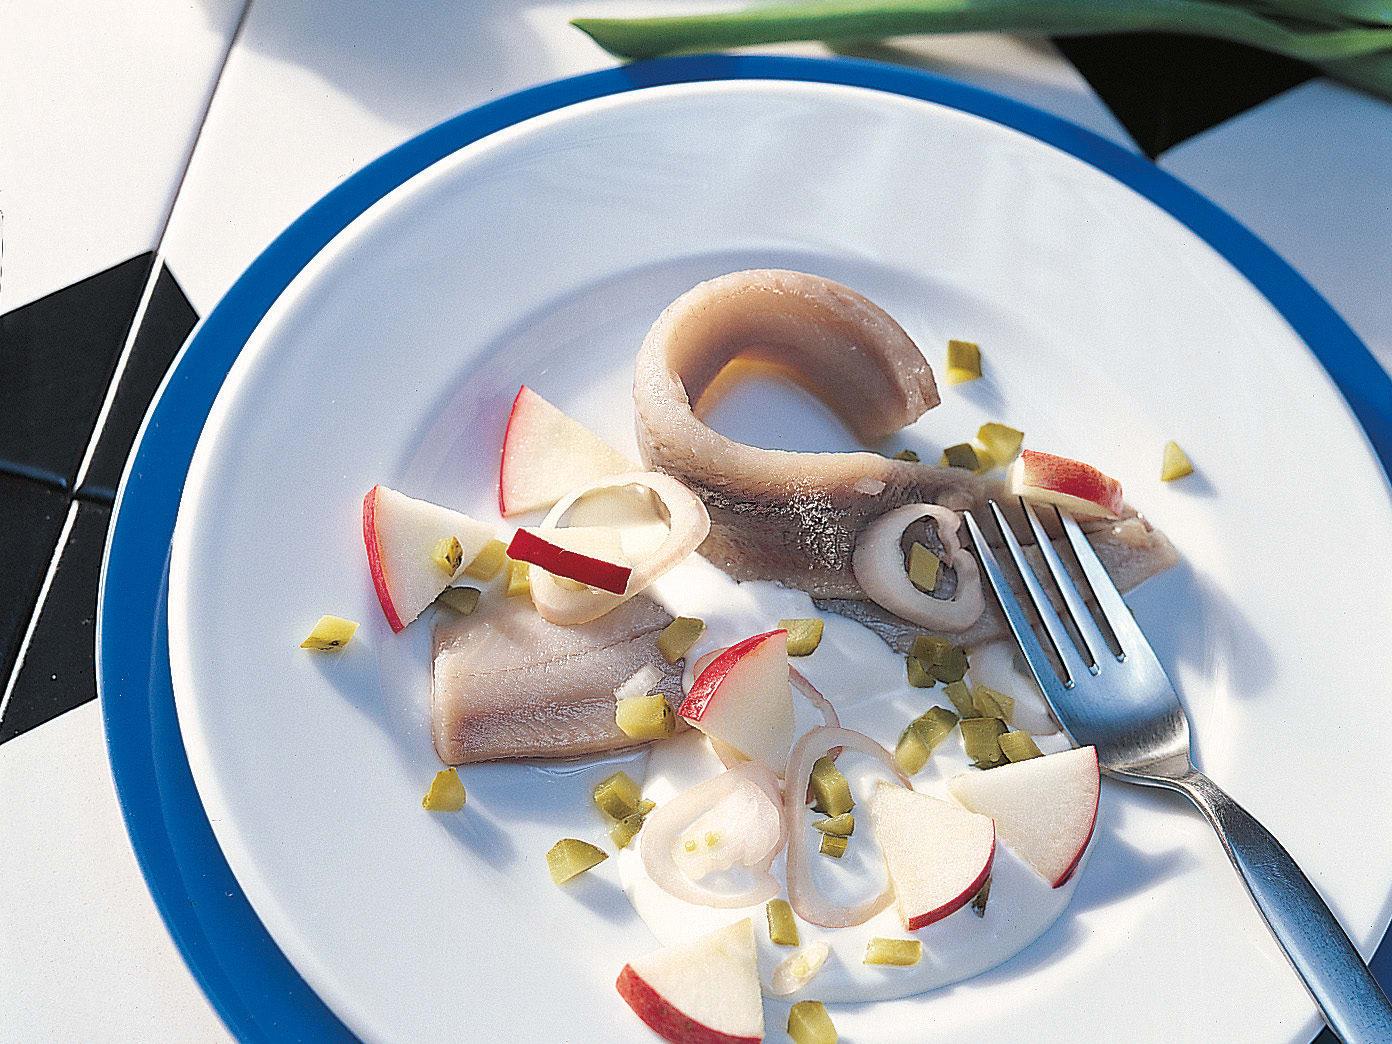 Harengs marinés et crème acidulée